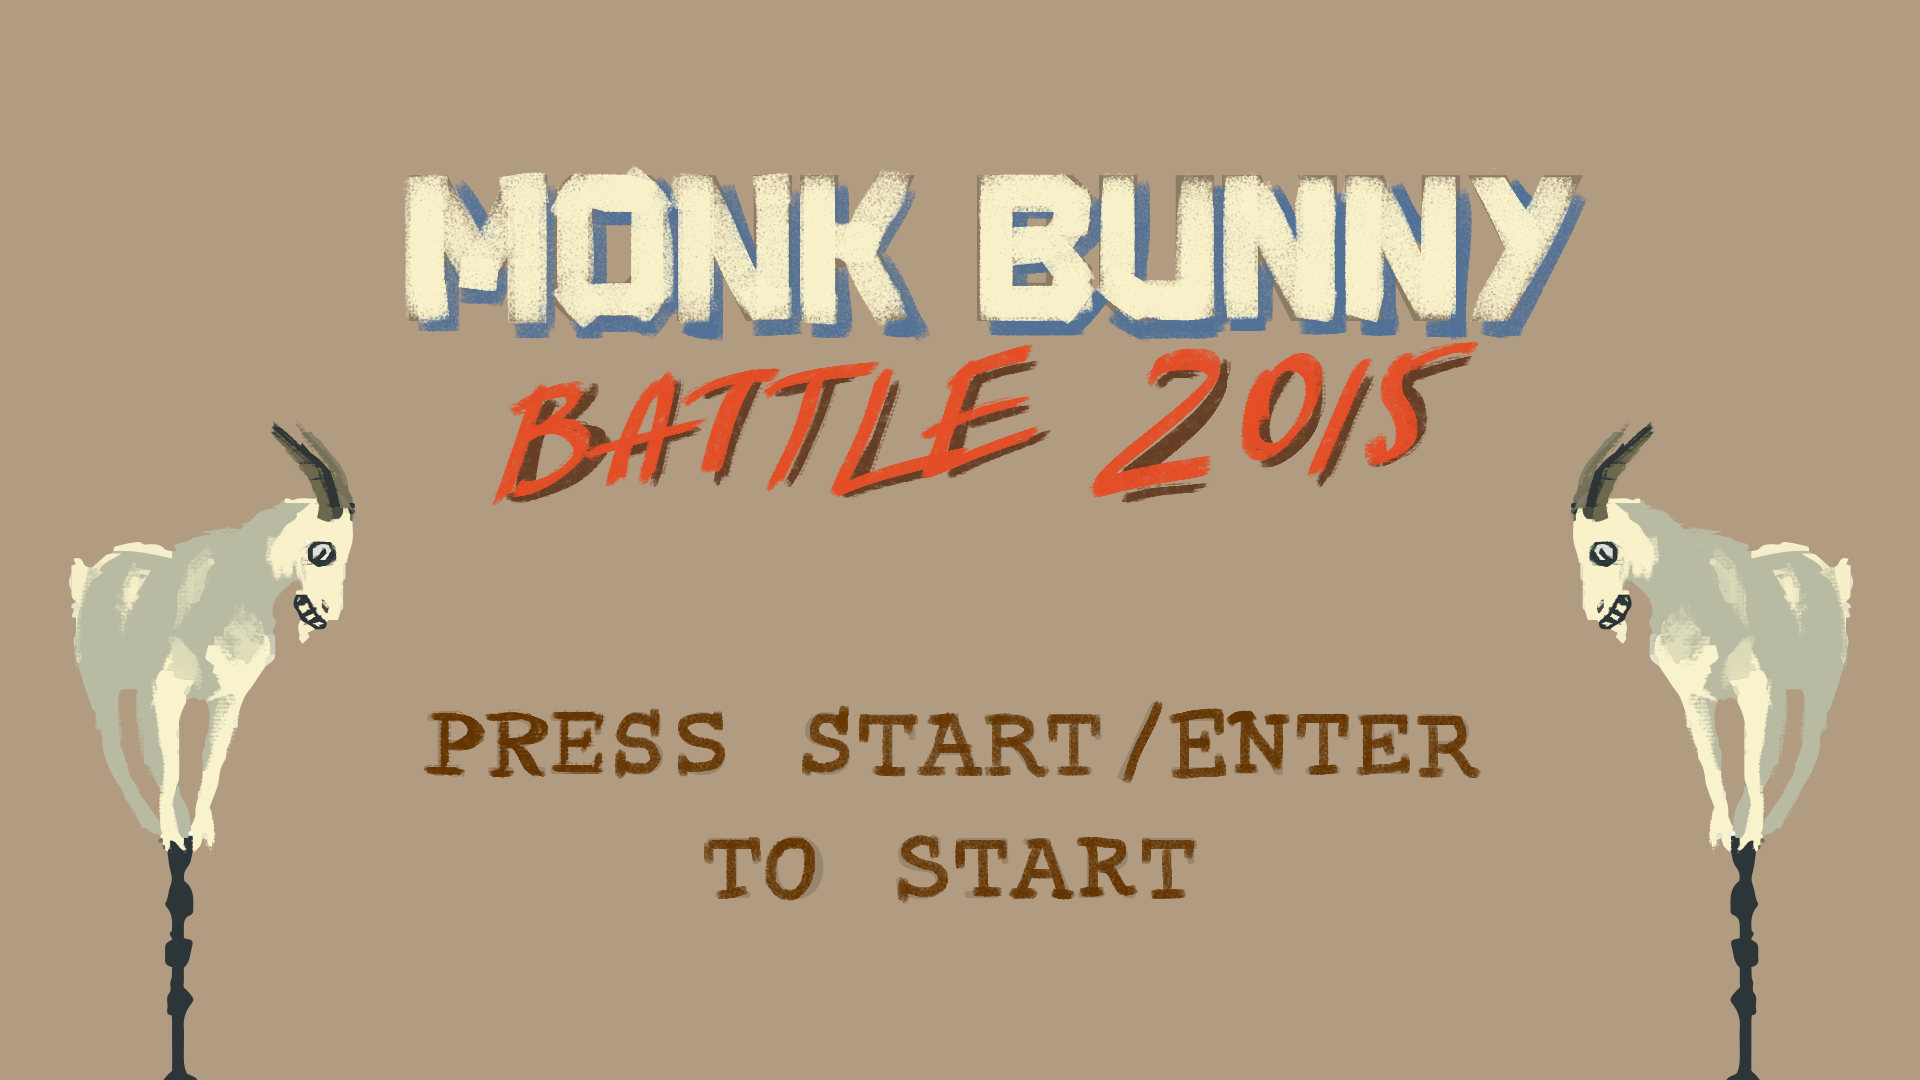 Monk Bunny Battle 2015